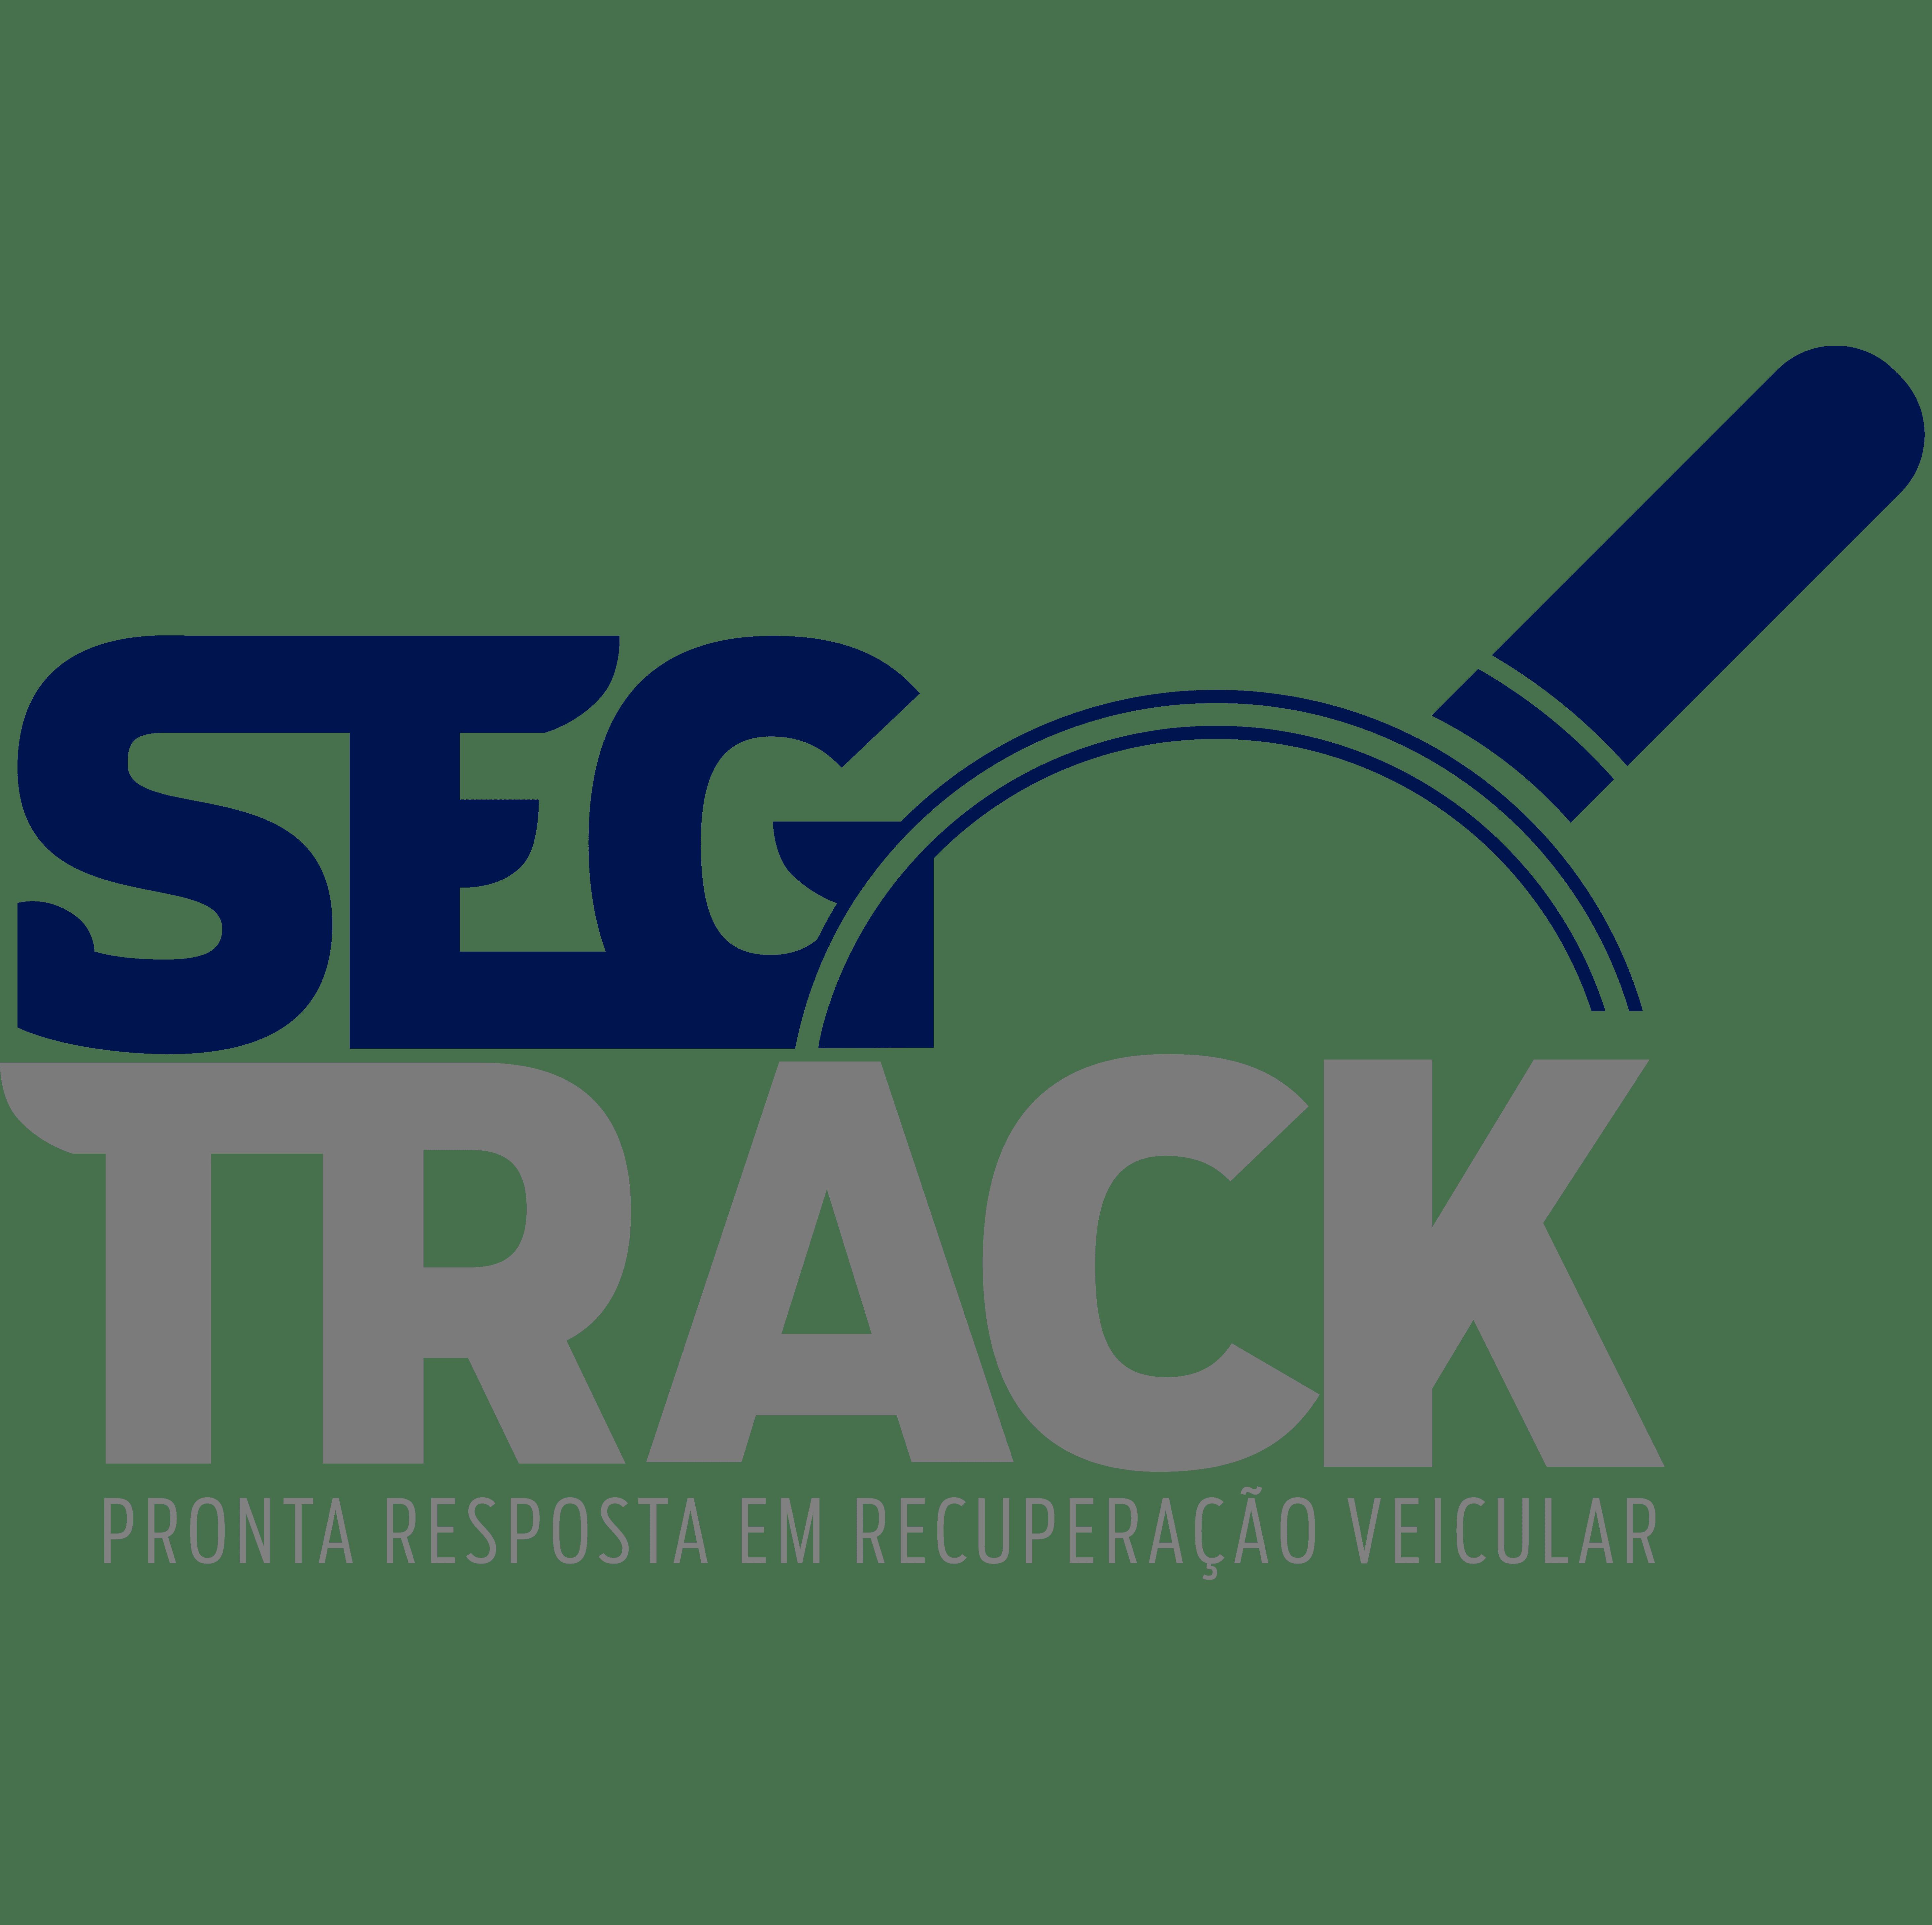 SegTrack  – Pronta Resposta